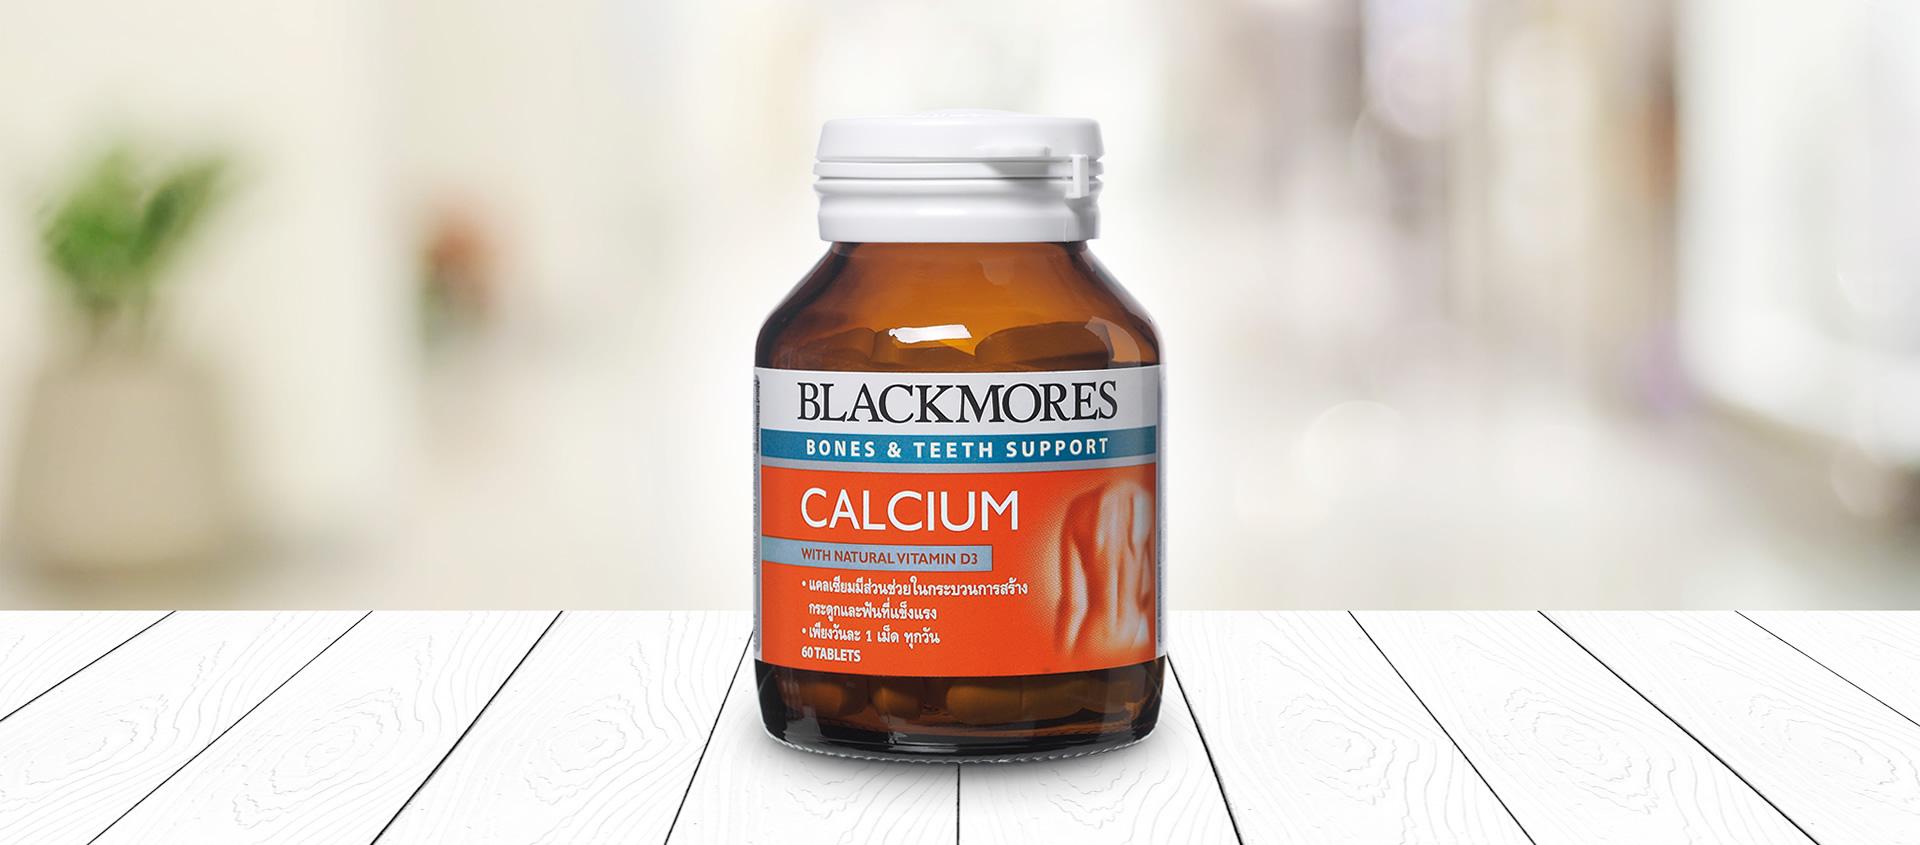 Blackmores Calcium แบลคมอร์ส แคลเซียม (ผลิตภัณฑ์เสริมอาหารแคลเซียมชนิดเม็ด)